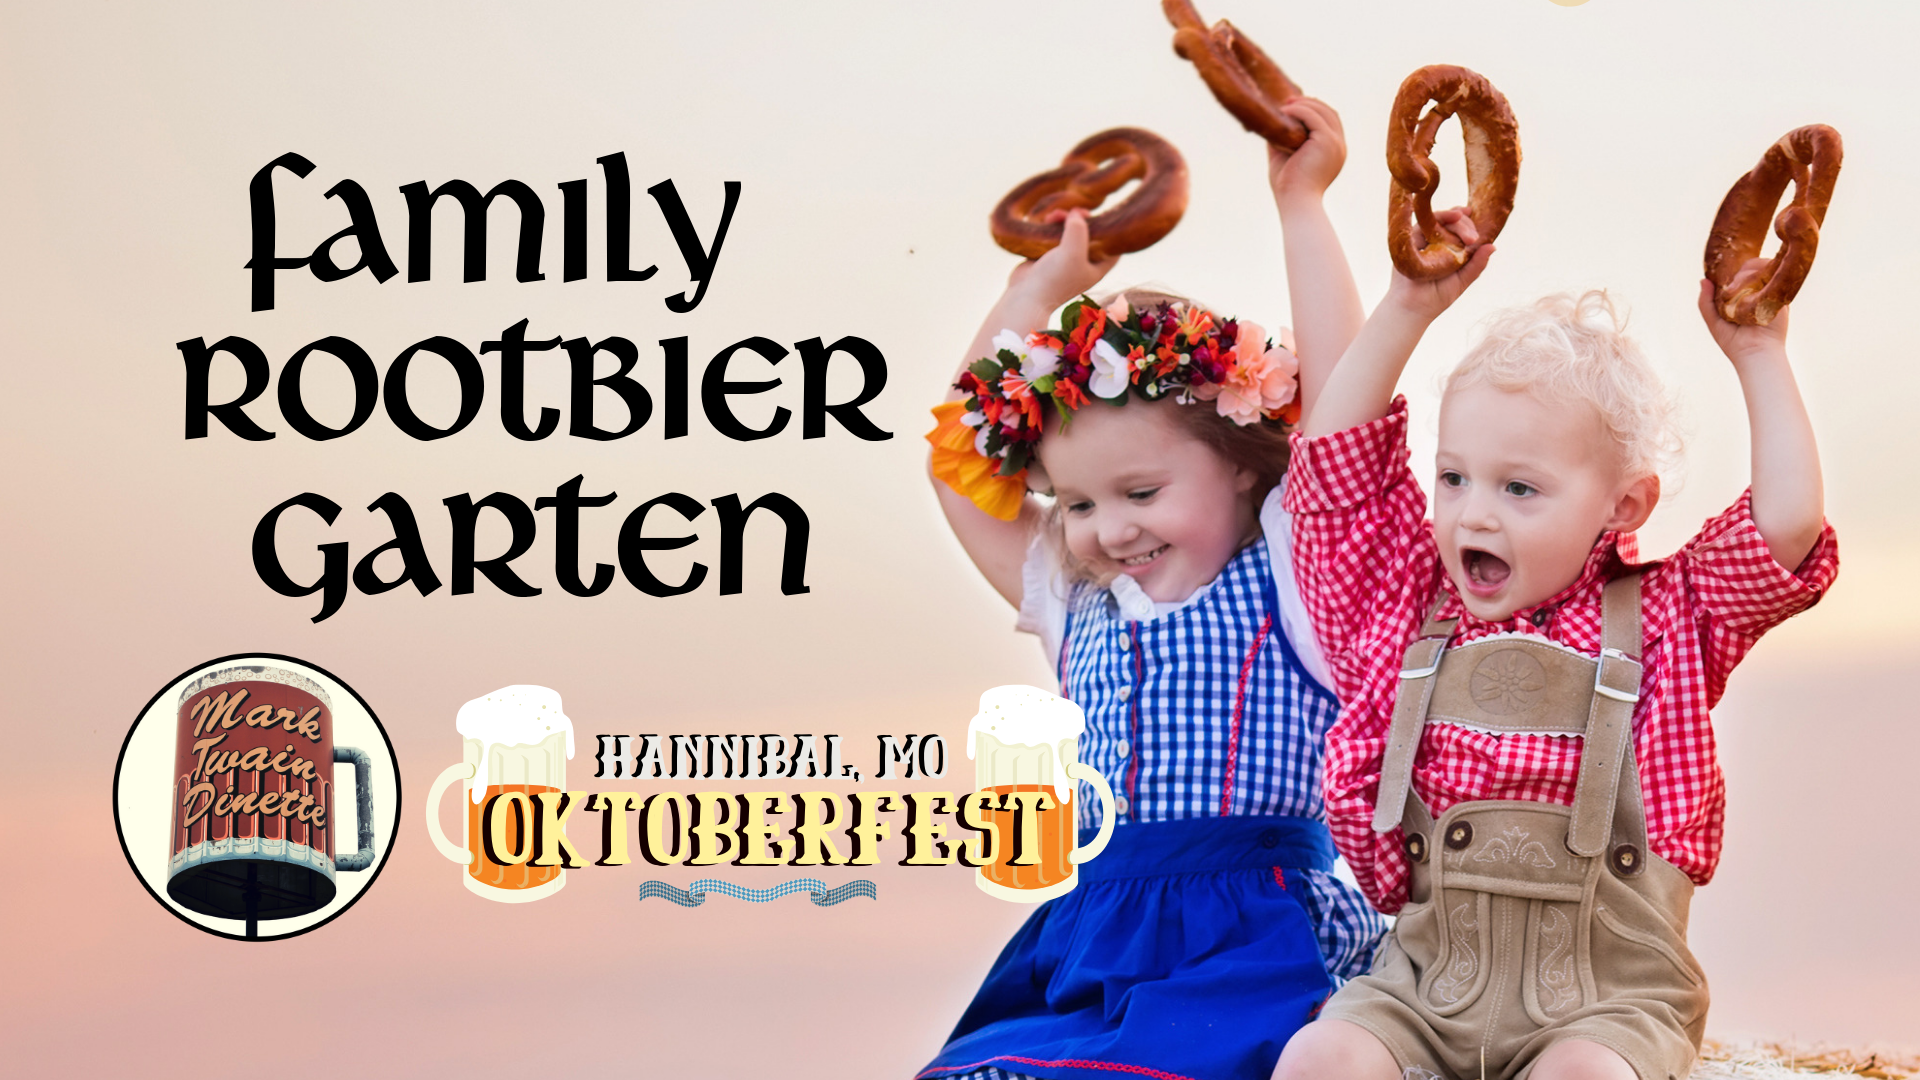 Festival Oktoberfest Hannibal, Missouri